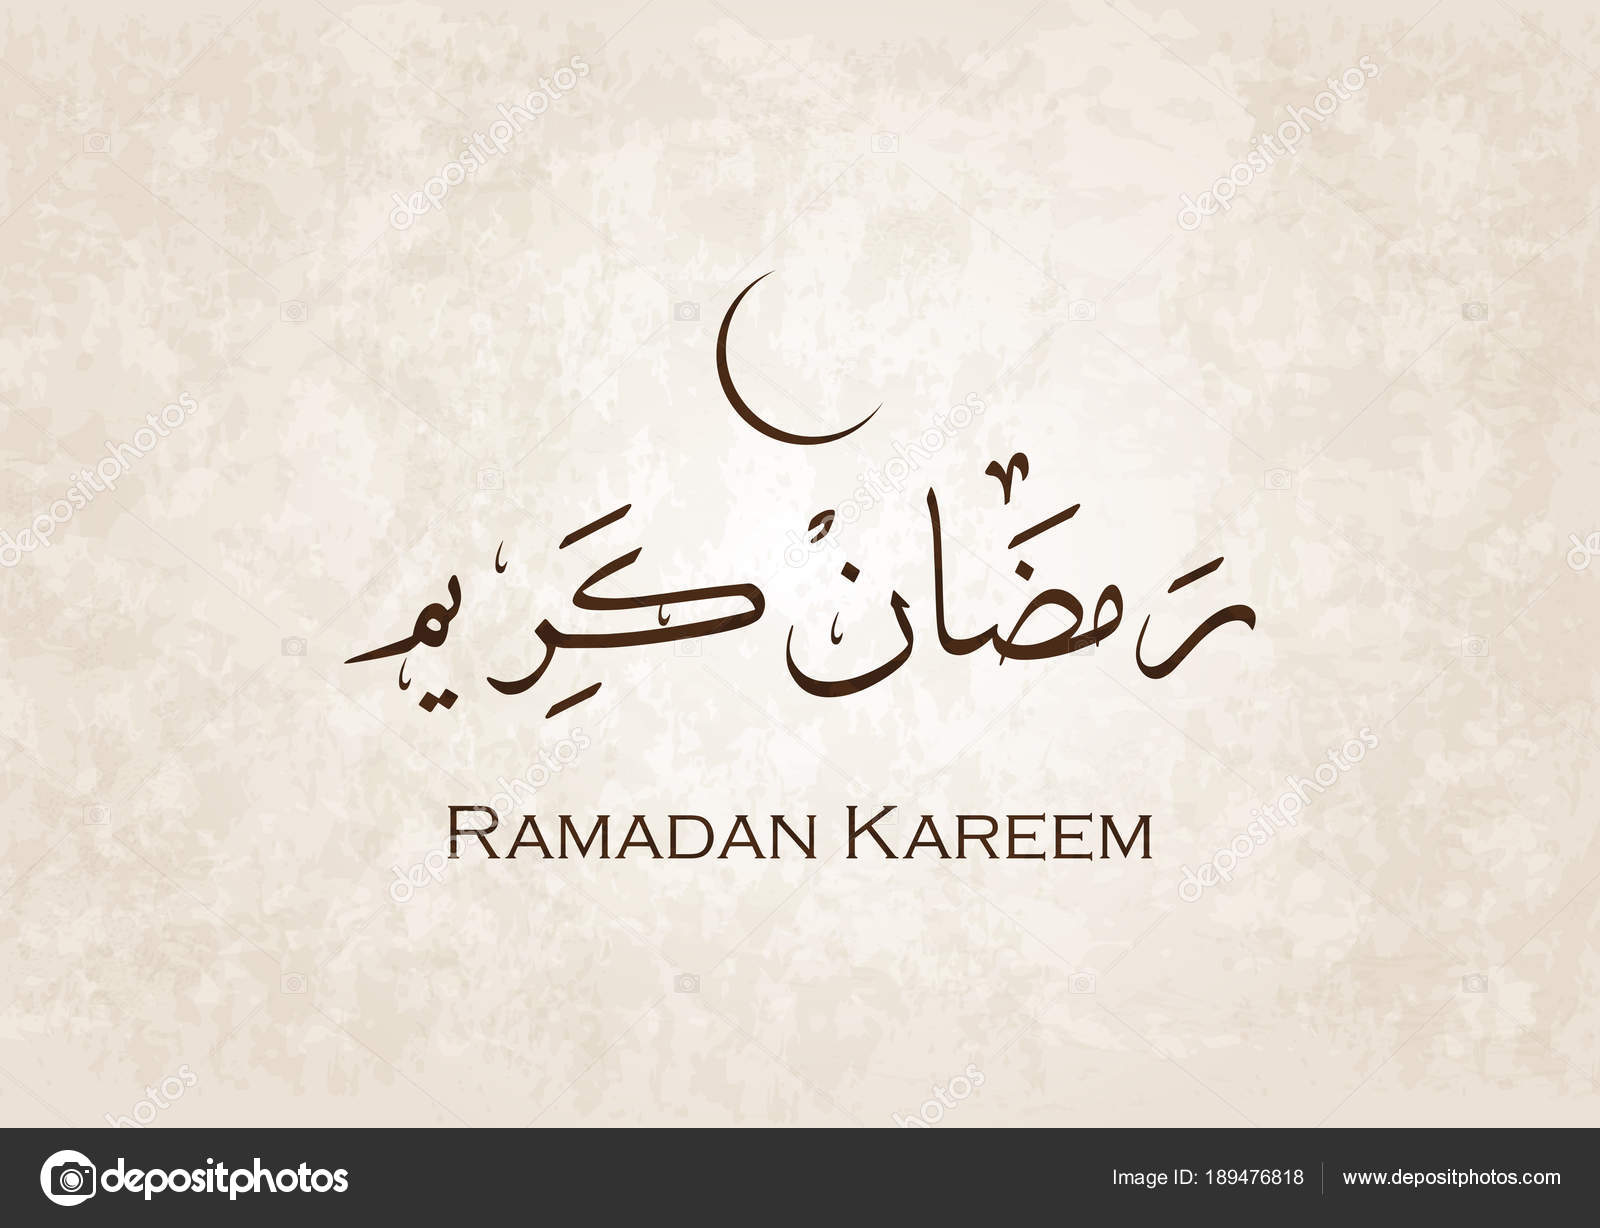 Ramadan kareem greeting card creative arabic calligraphy